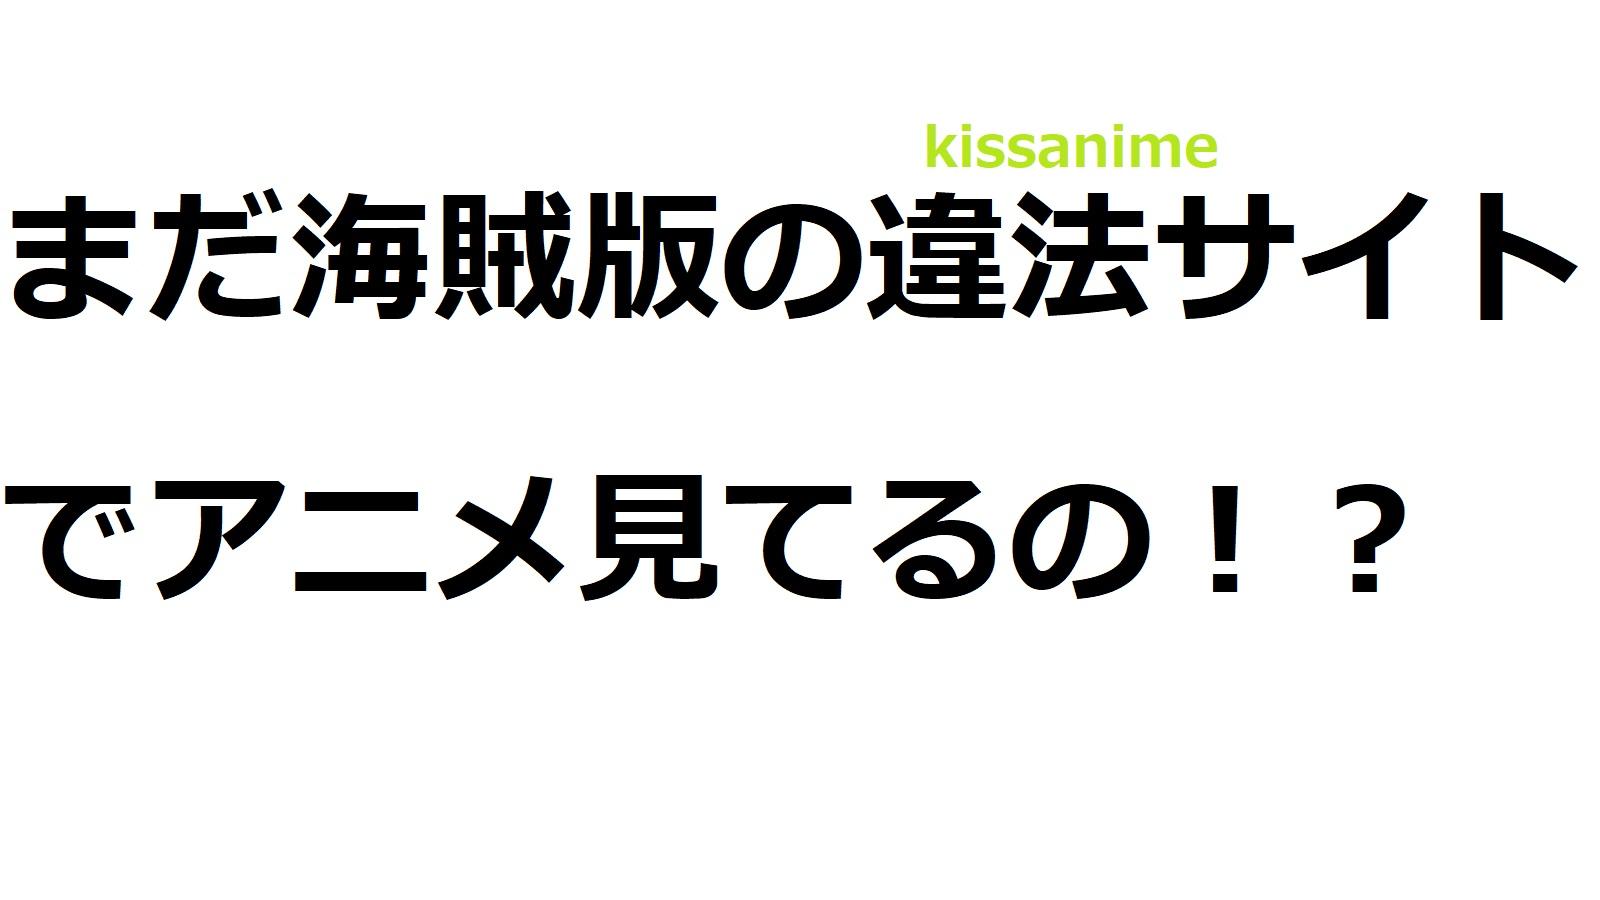 kissanime違法サイト